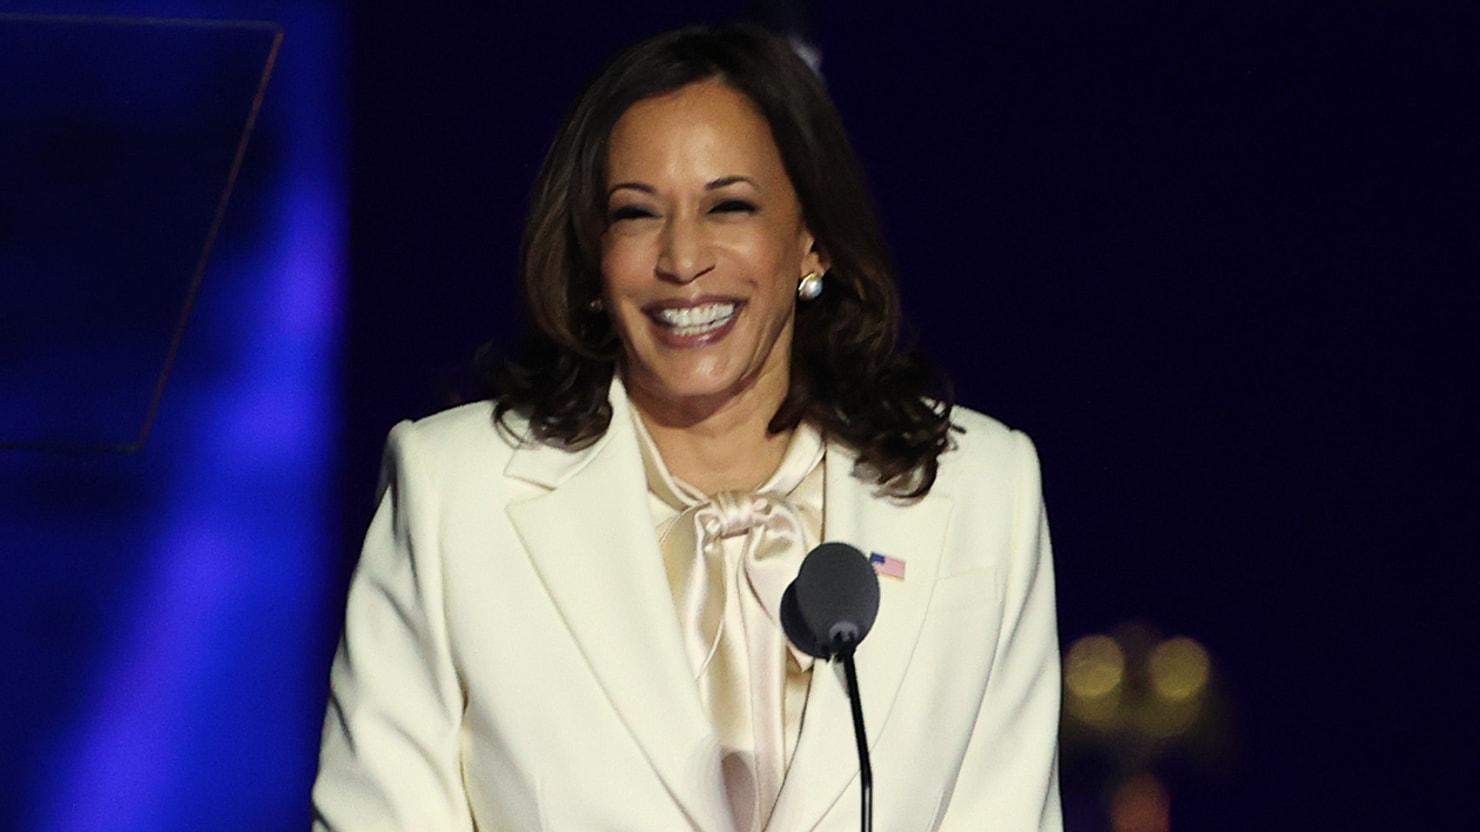 CA School Board President Resigns After Wife's Racist Kamala Tweets